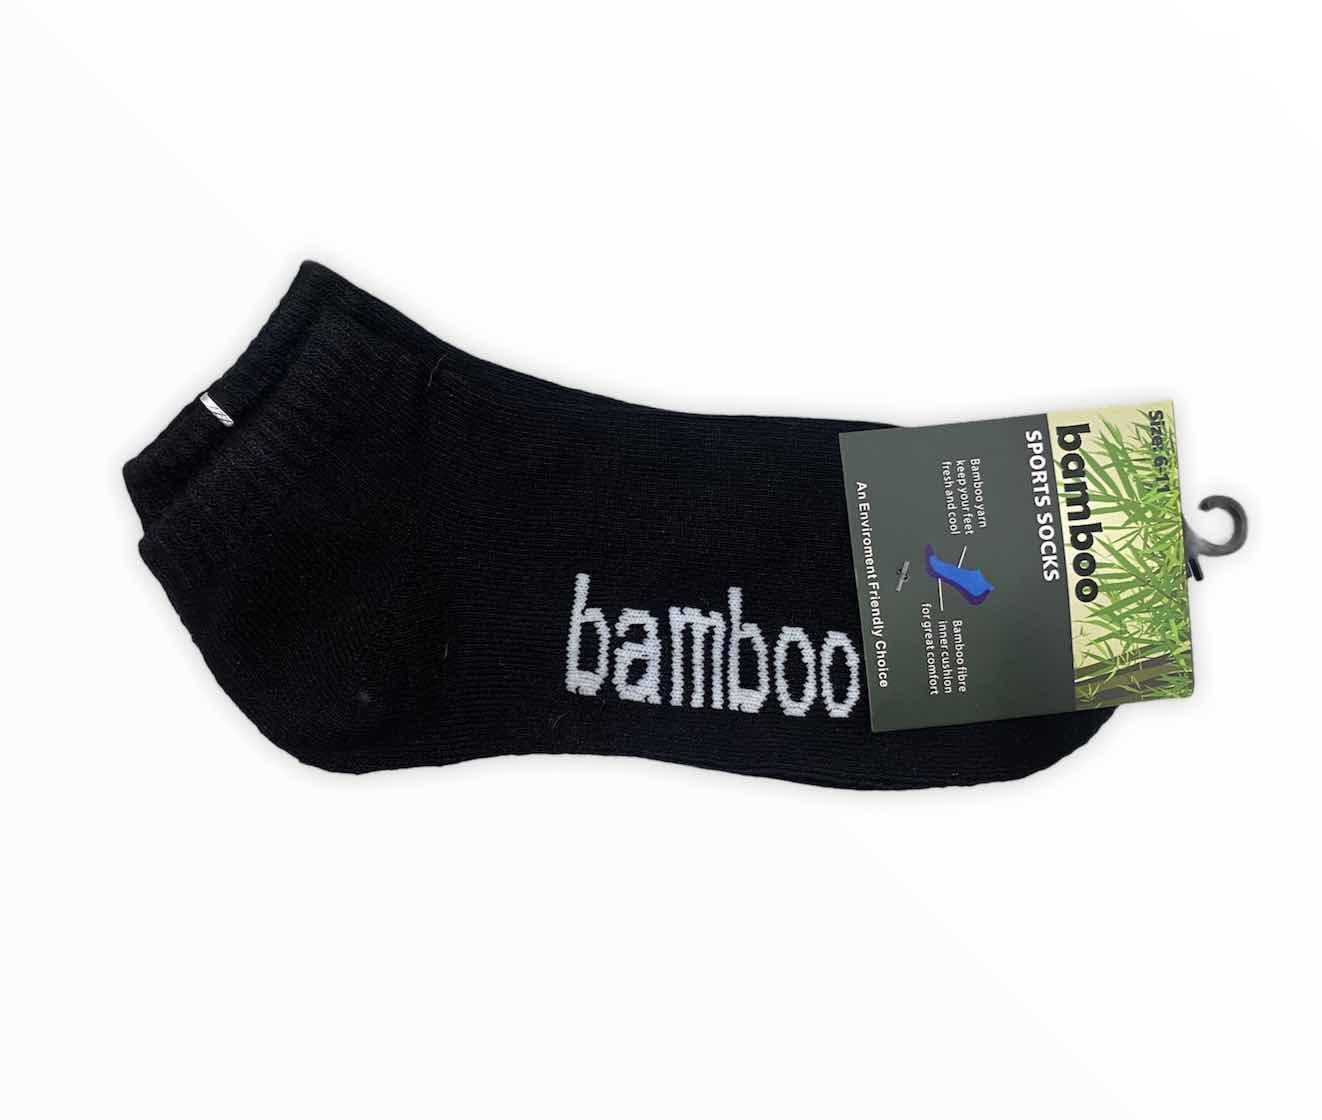 Socks Bamboo Low Cut Cushioned Sports Socks